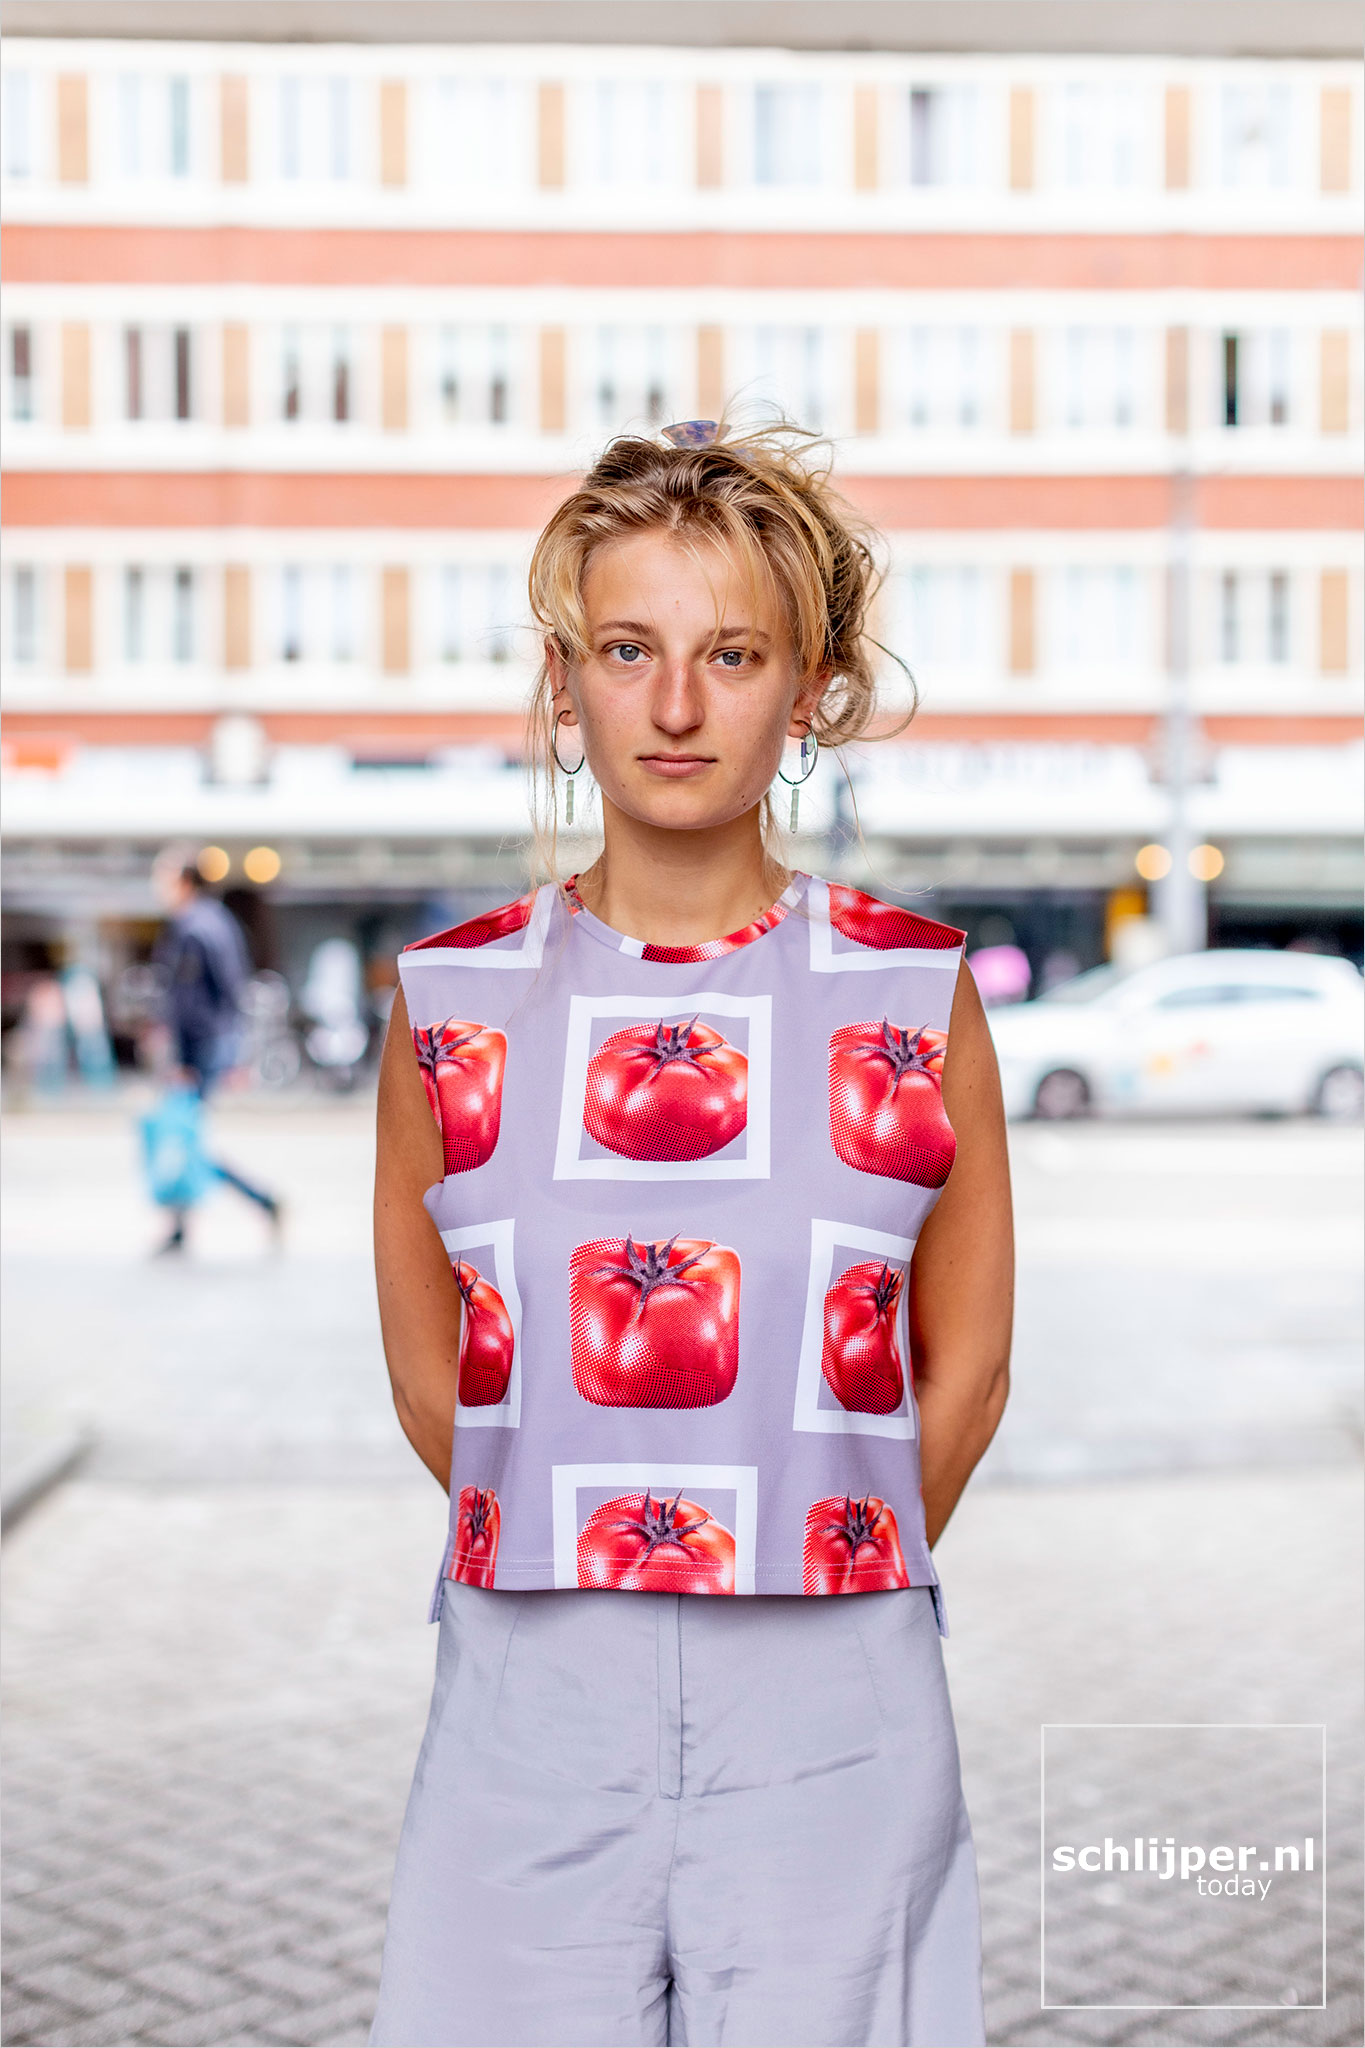 The Netherlands, Amsterdam, 6 augustus 2021